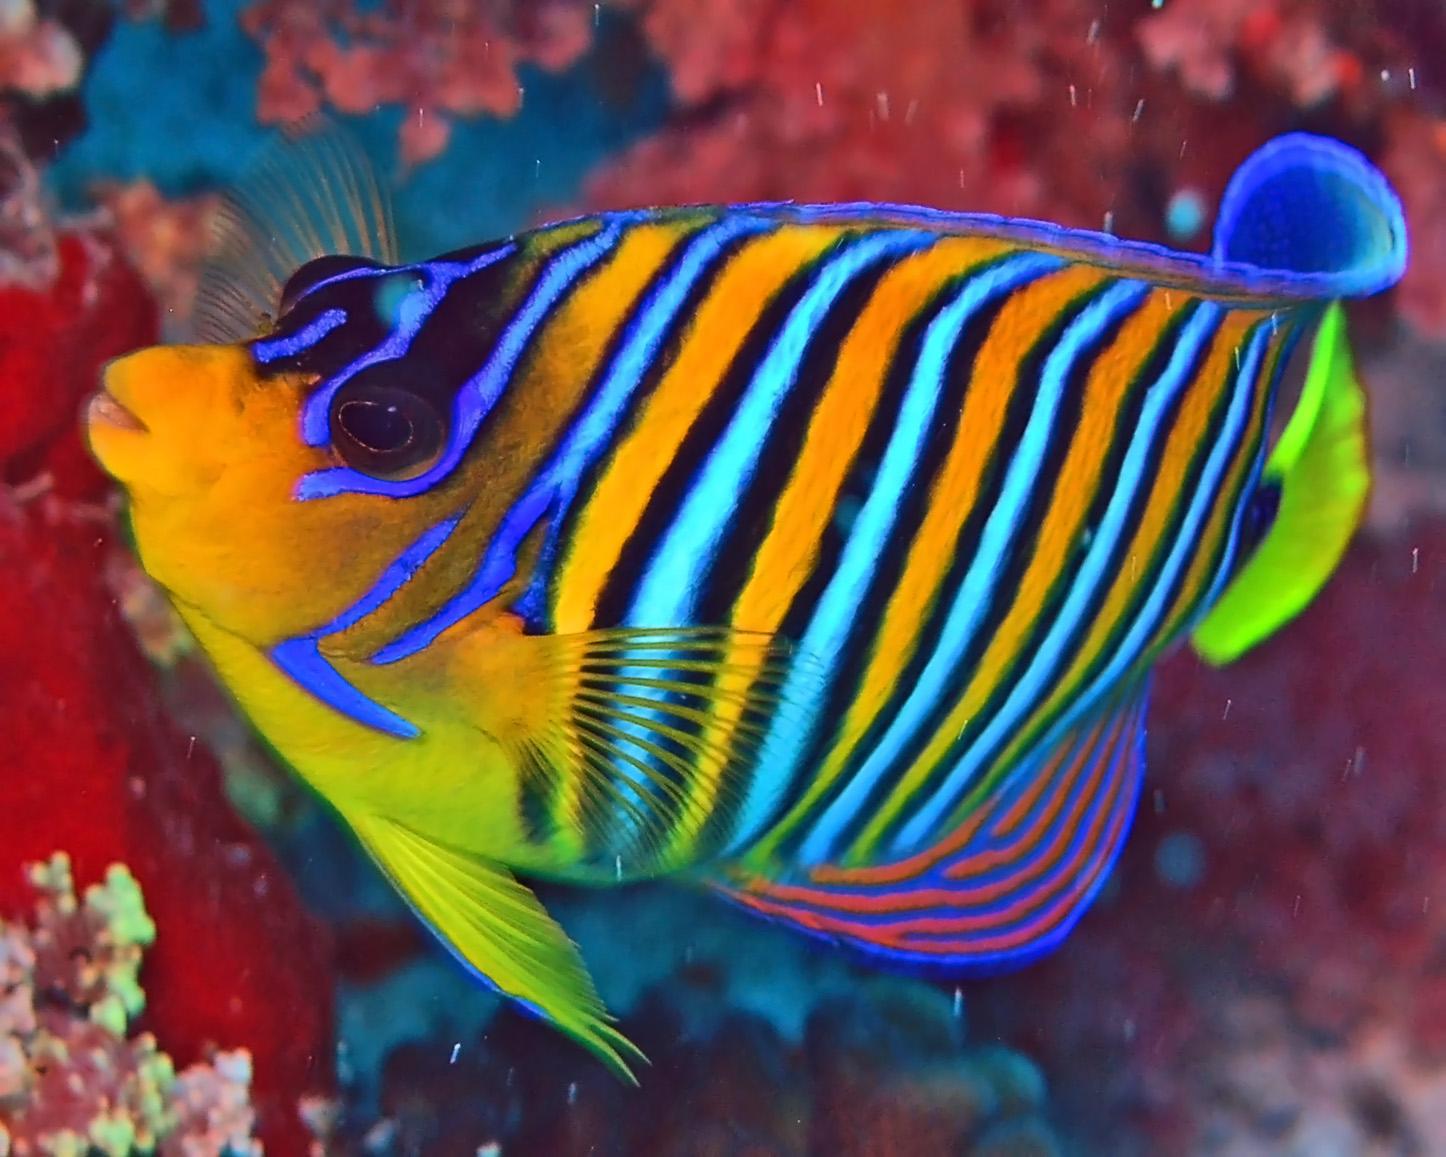 The Coral Reef - Royal Angelfish (Olivia K.)